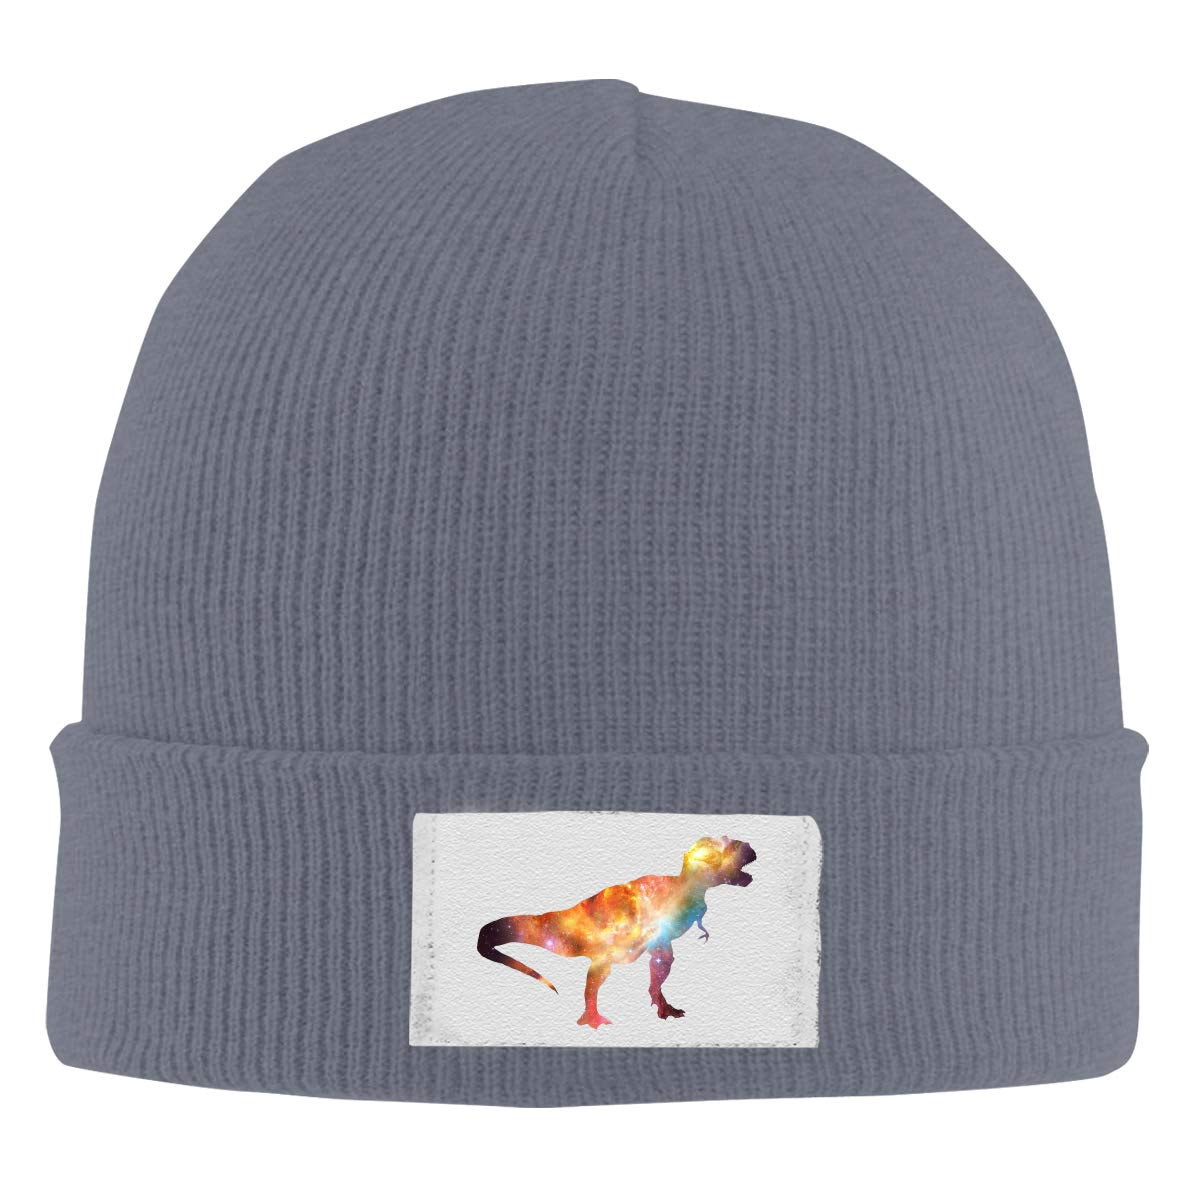 Galaxy Dinosaur Top Level Beanie Men Women Unisex Stylish Slouch Beanie Hats Black